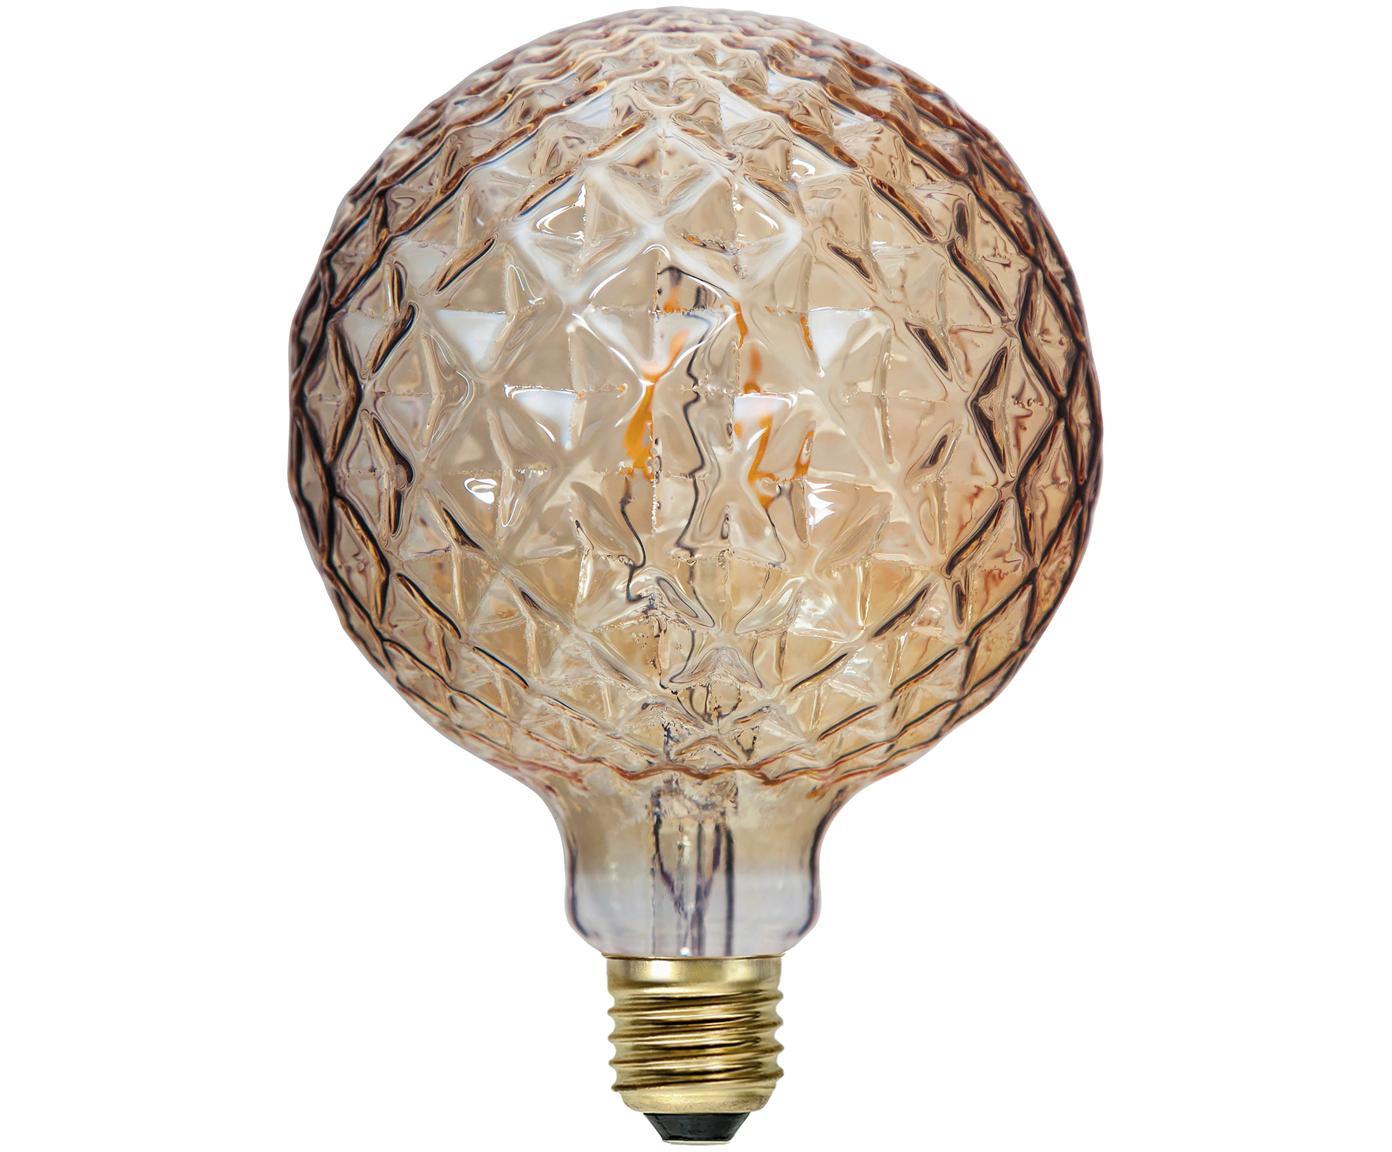 Lampadina a LED XL Soft Glow (E27/ 2,2Watt), Paralume: Vetro, Base lampadina: ottone, Ambra, Ø 13 x Alt. 18 cm